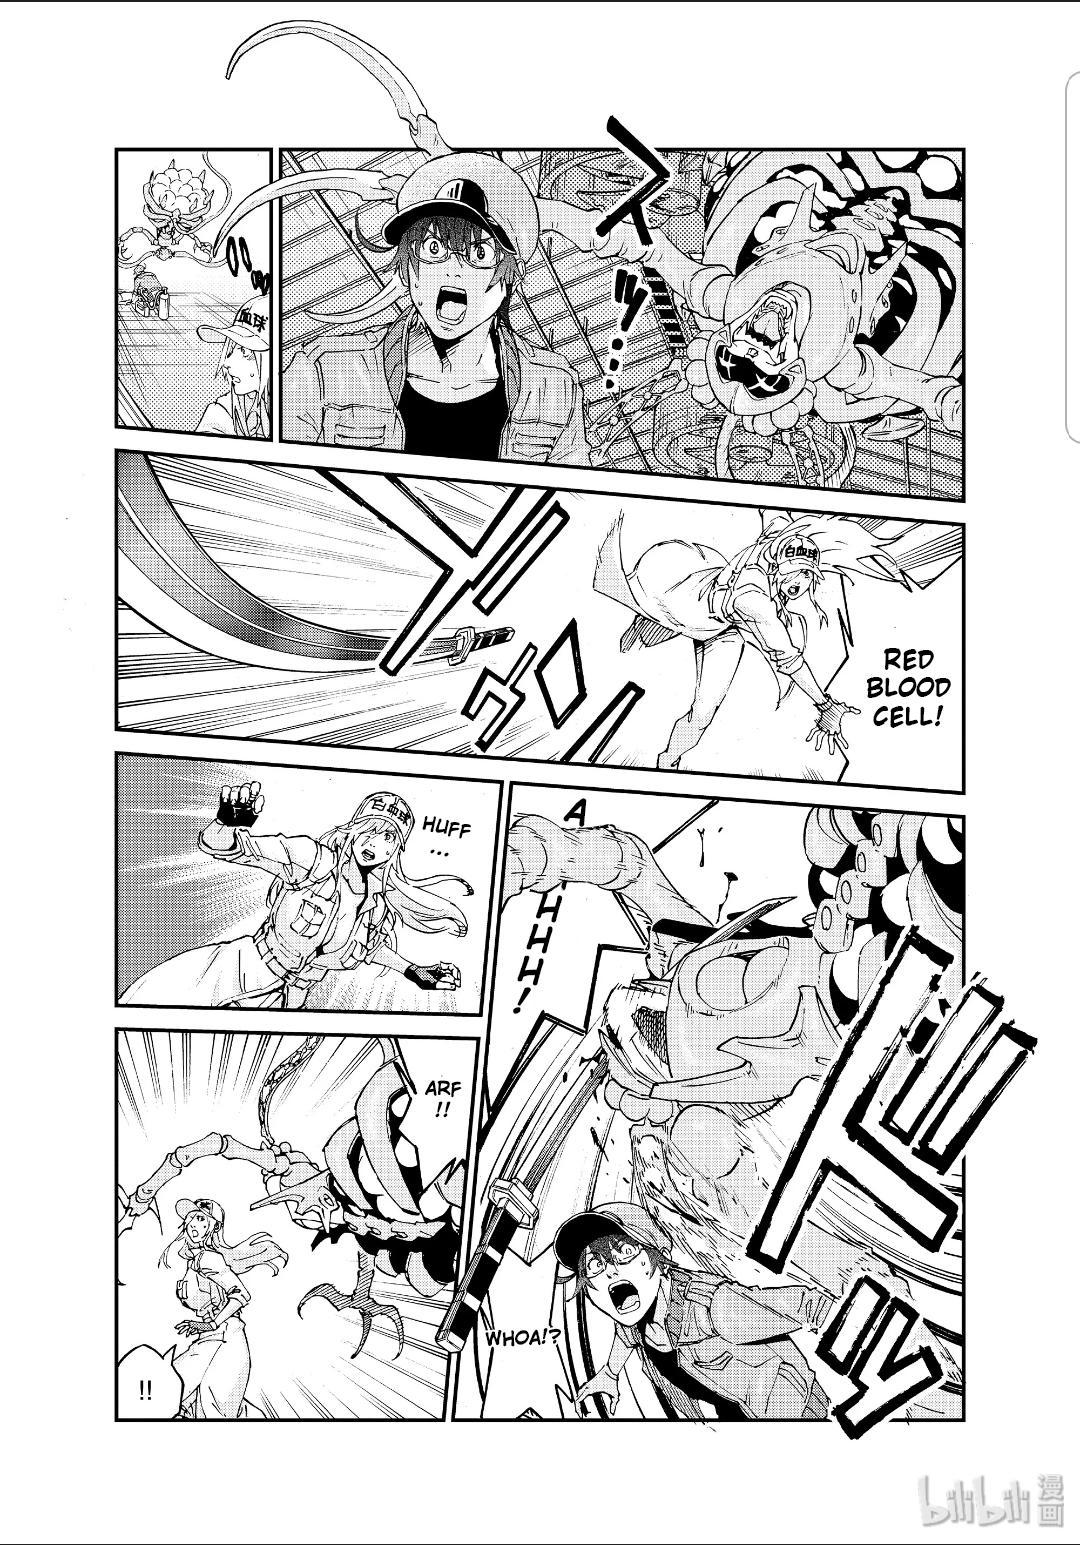 Hataraku Saibou Black Vol.7 Chapter 39 page 25 - Mangakakalots.com